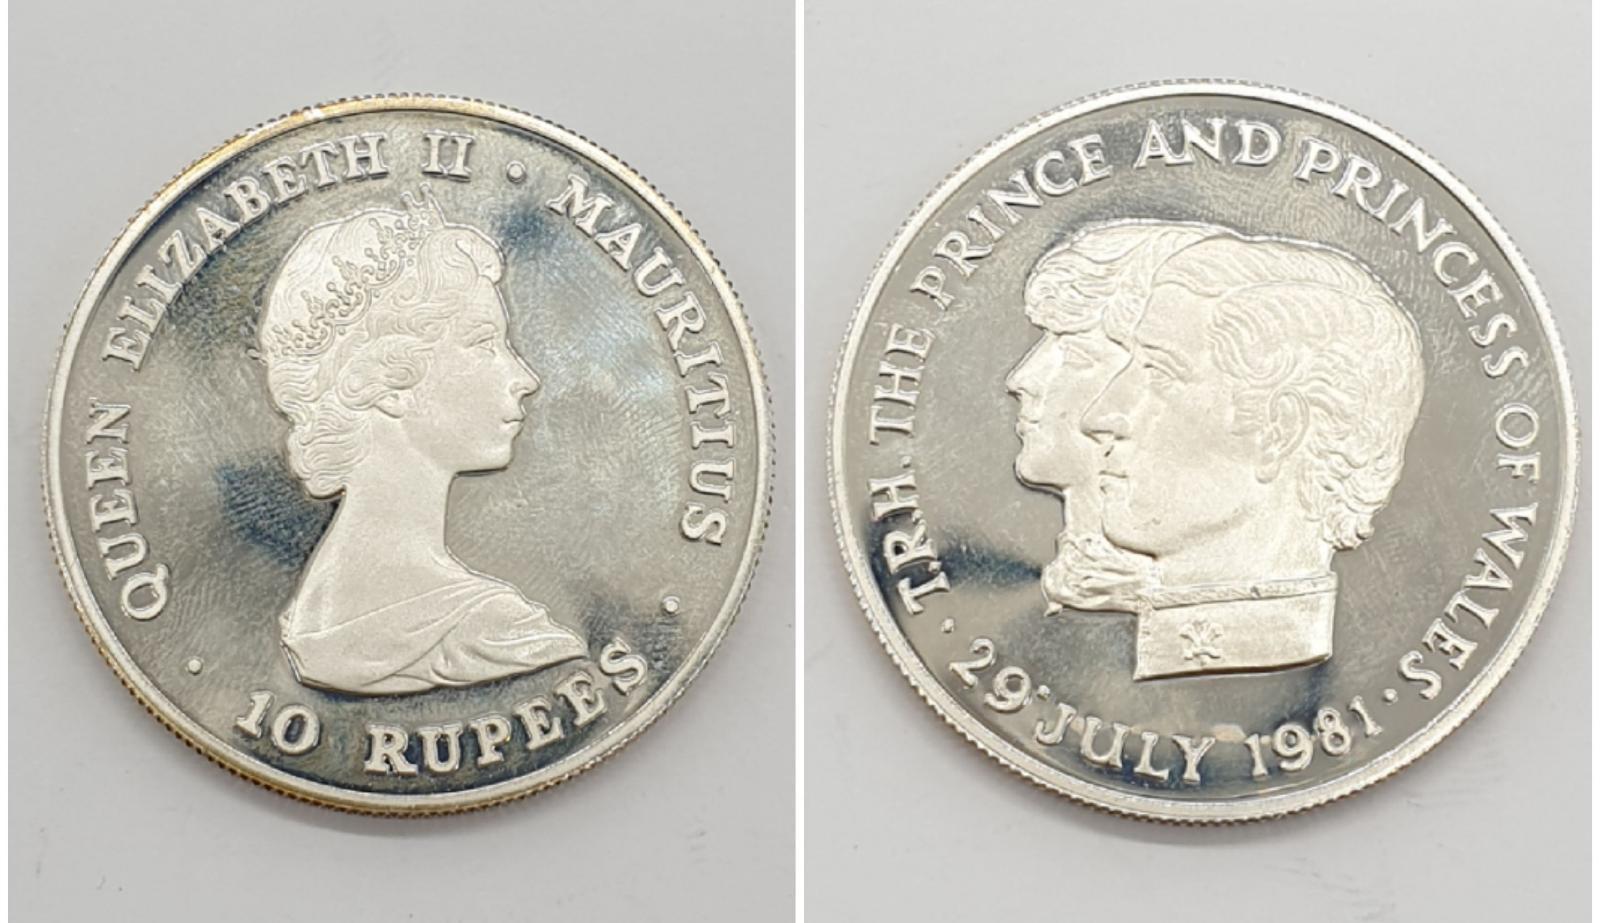 Silver Commemorative Coin. Royal Wedding 1981 10 Rupees 28.4g Mauritius